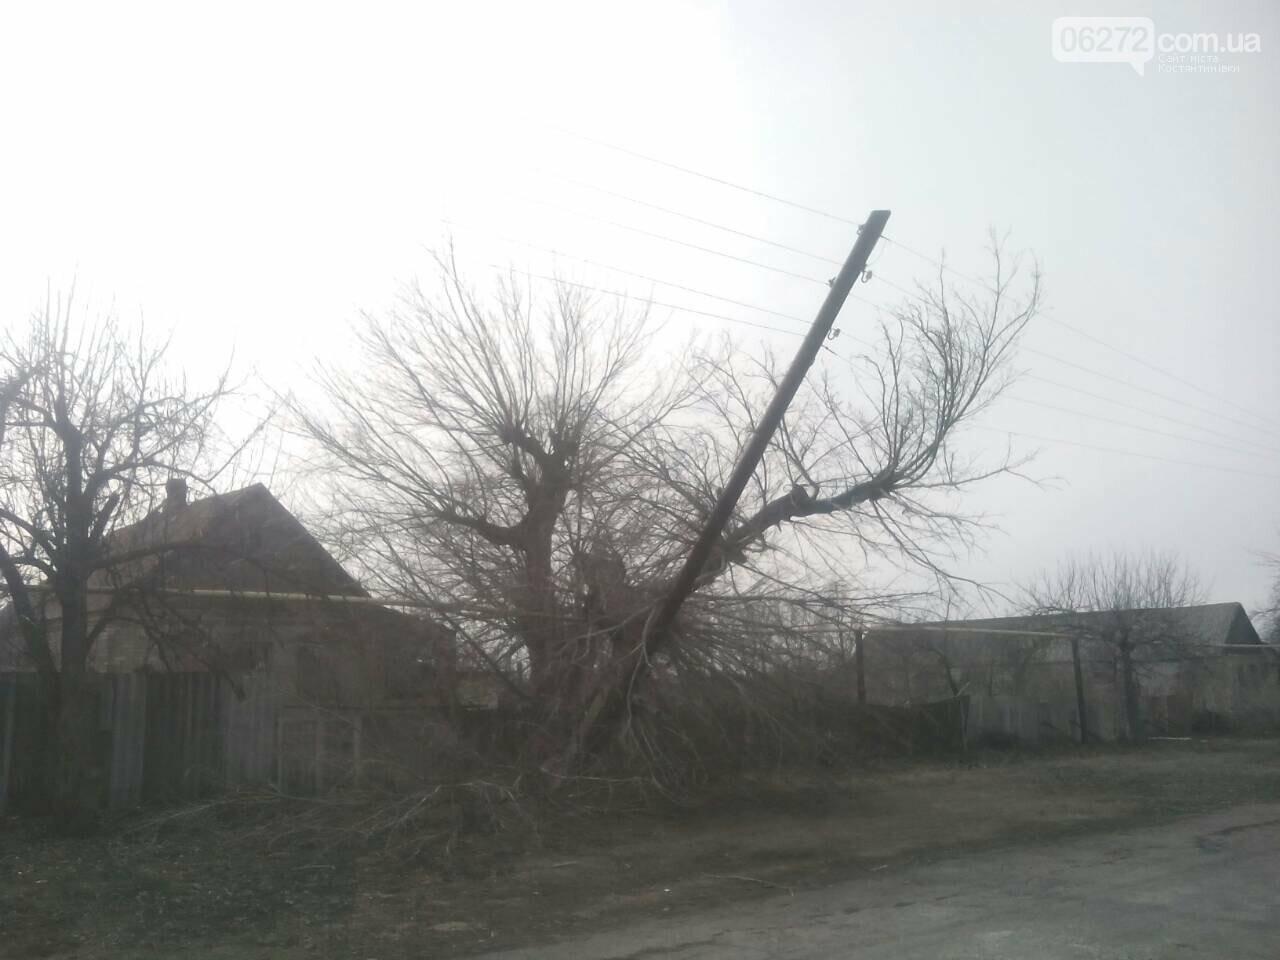 В Константиновском районе дерево упало на столб линии электропередач, фото-3